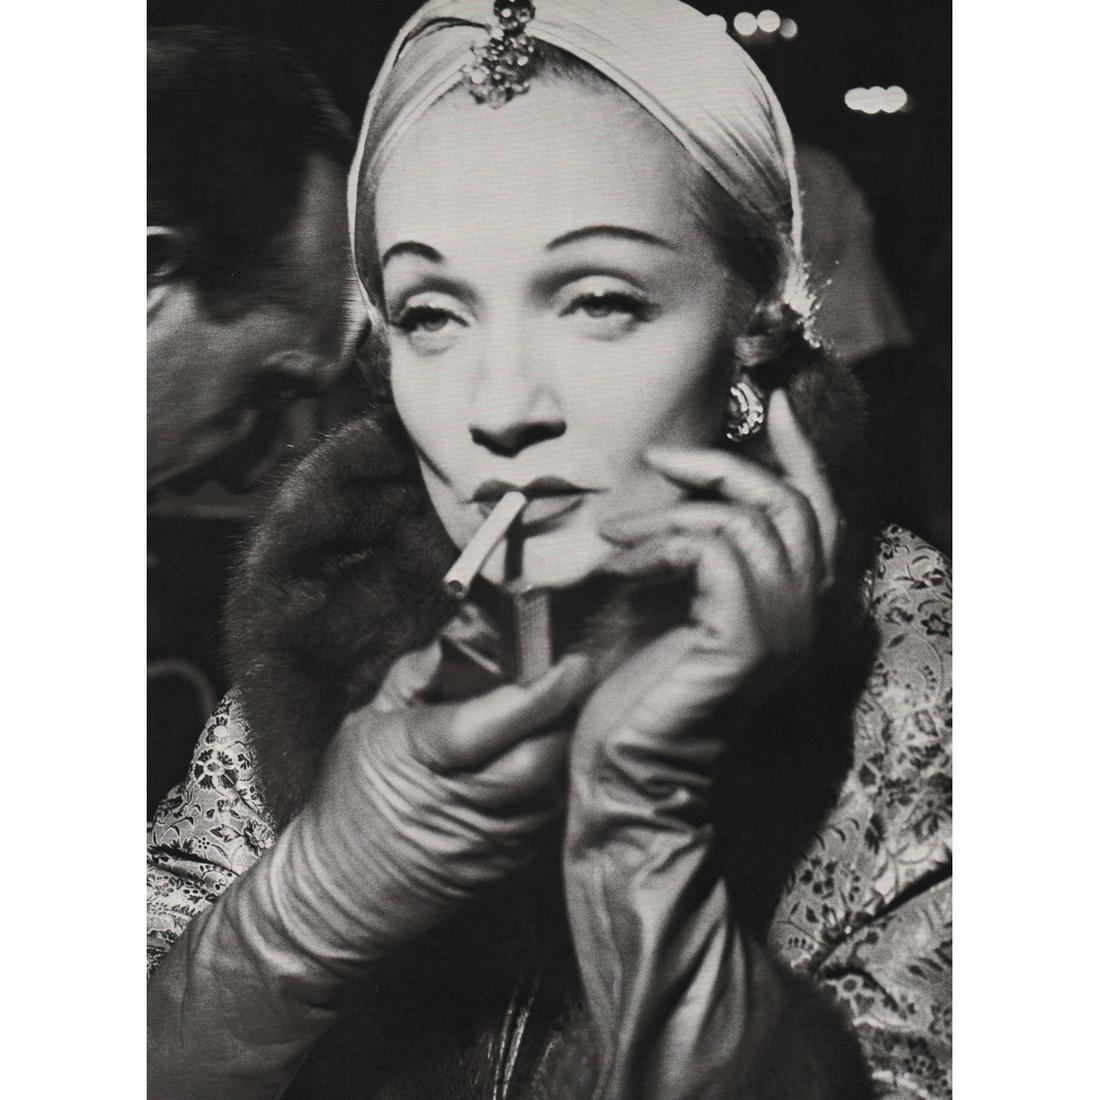 RICHARD AVEDON - Marlene Dietrich, Turban by Dior